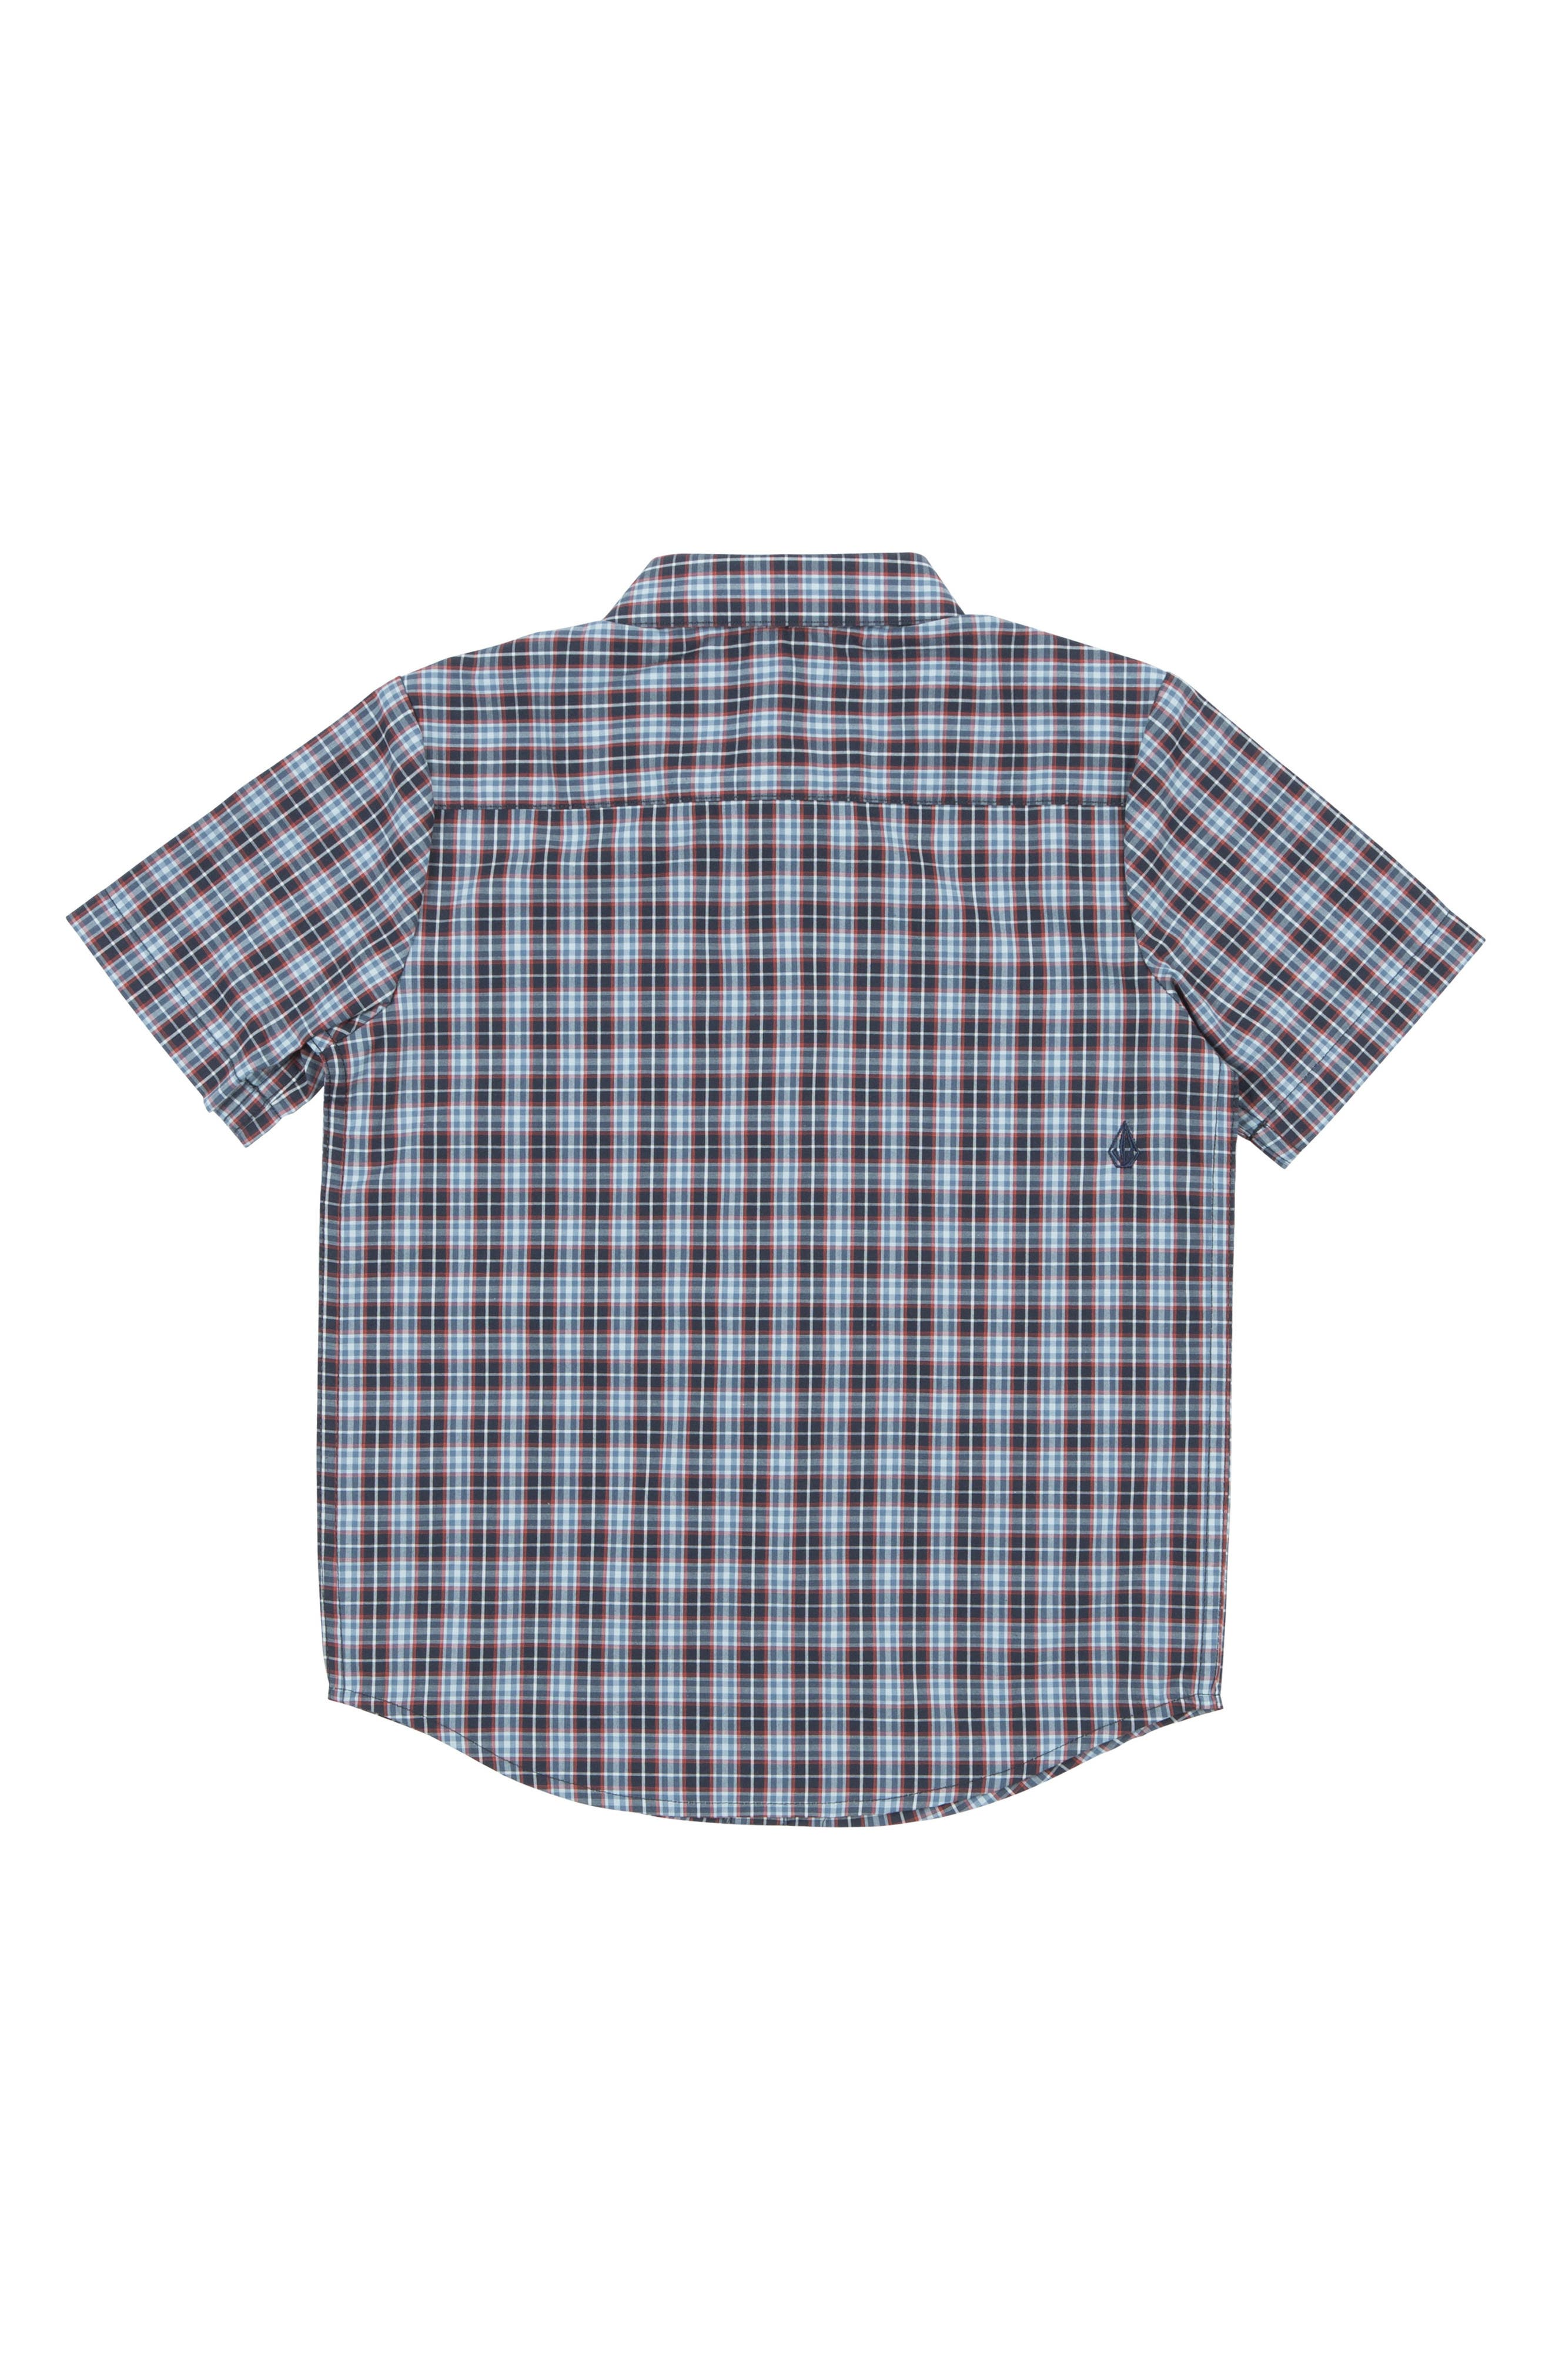 Harper Plaid Woven Shirt,                         Main,                         color, 410